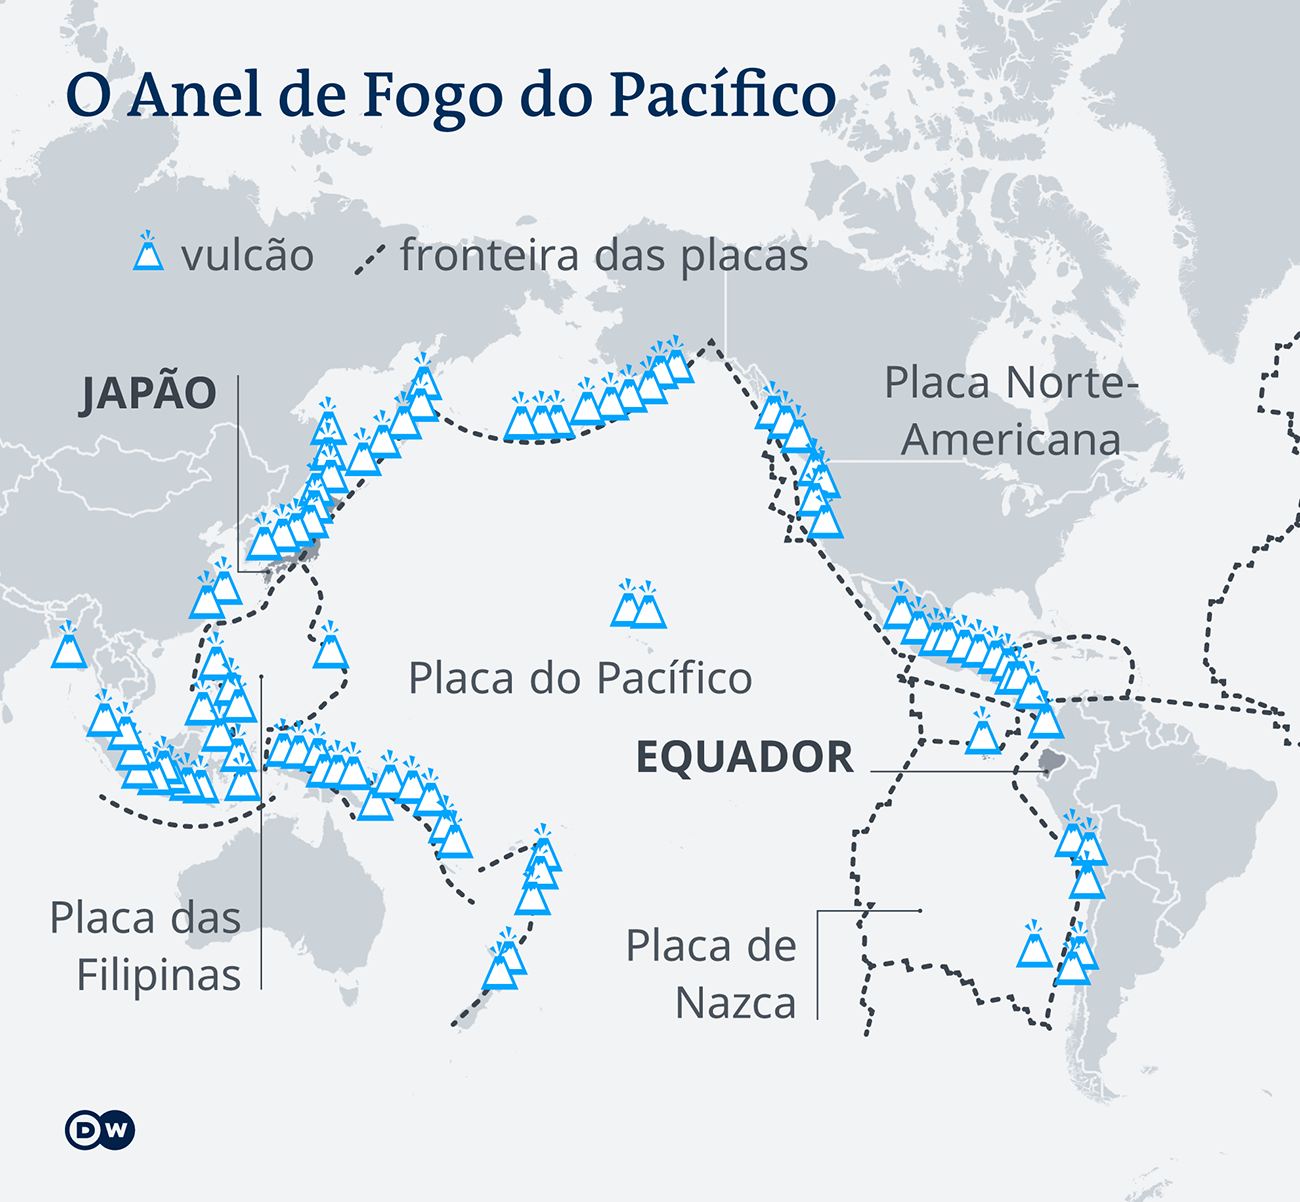 mapa mostra anel de fogo do Pacífico